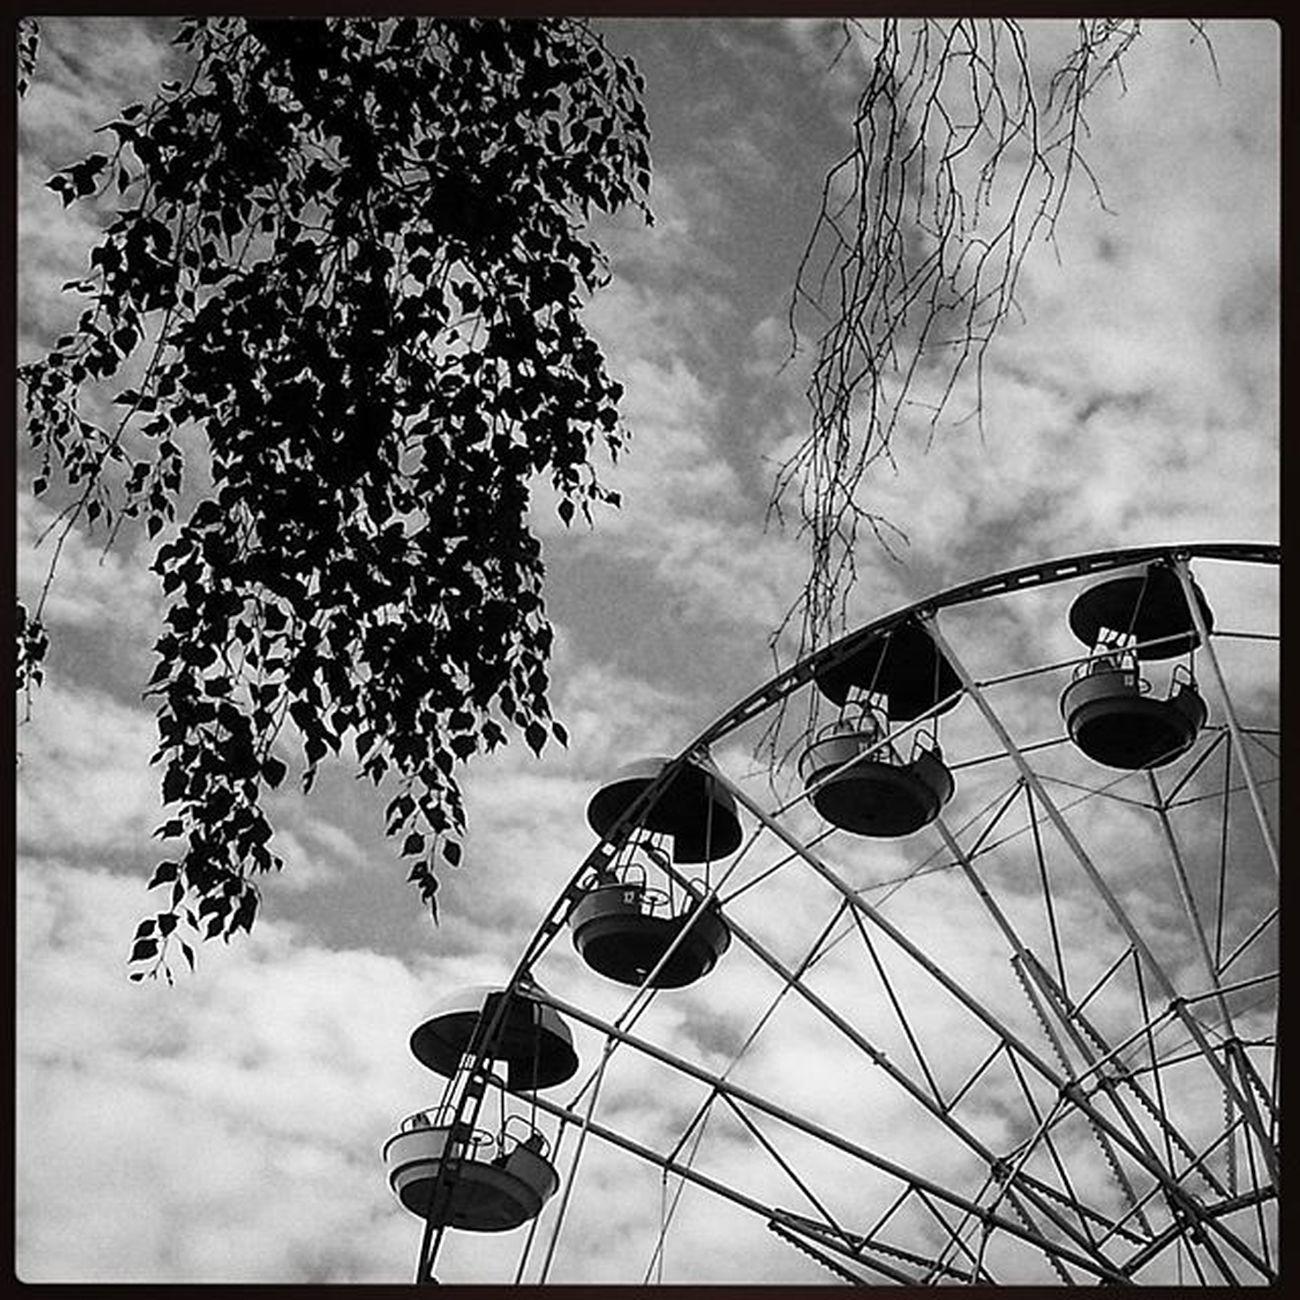 Ig_europe Ig_bw Ig_moscow Parque  Cielo Sky Loves_bnw Estaes_cielos Bw Bnw Blancoynegro Blackandwhite Москва Измайловскийпарк колесообозрения чернобелоефото Чб